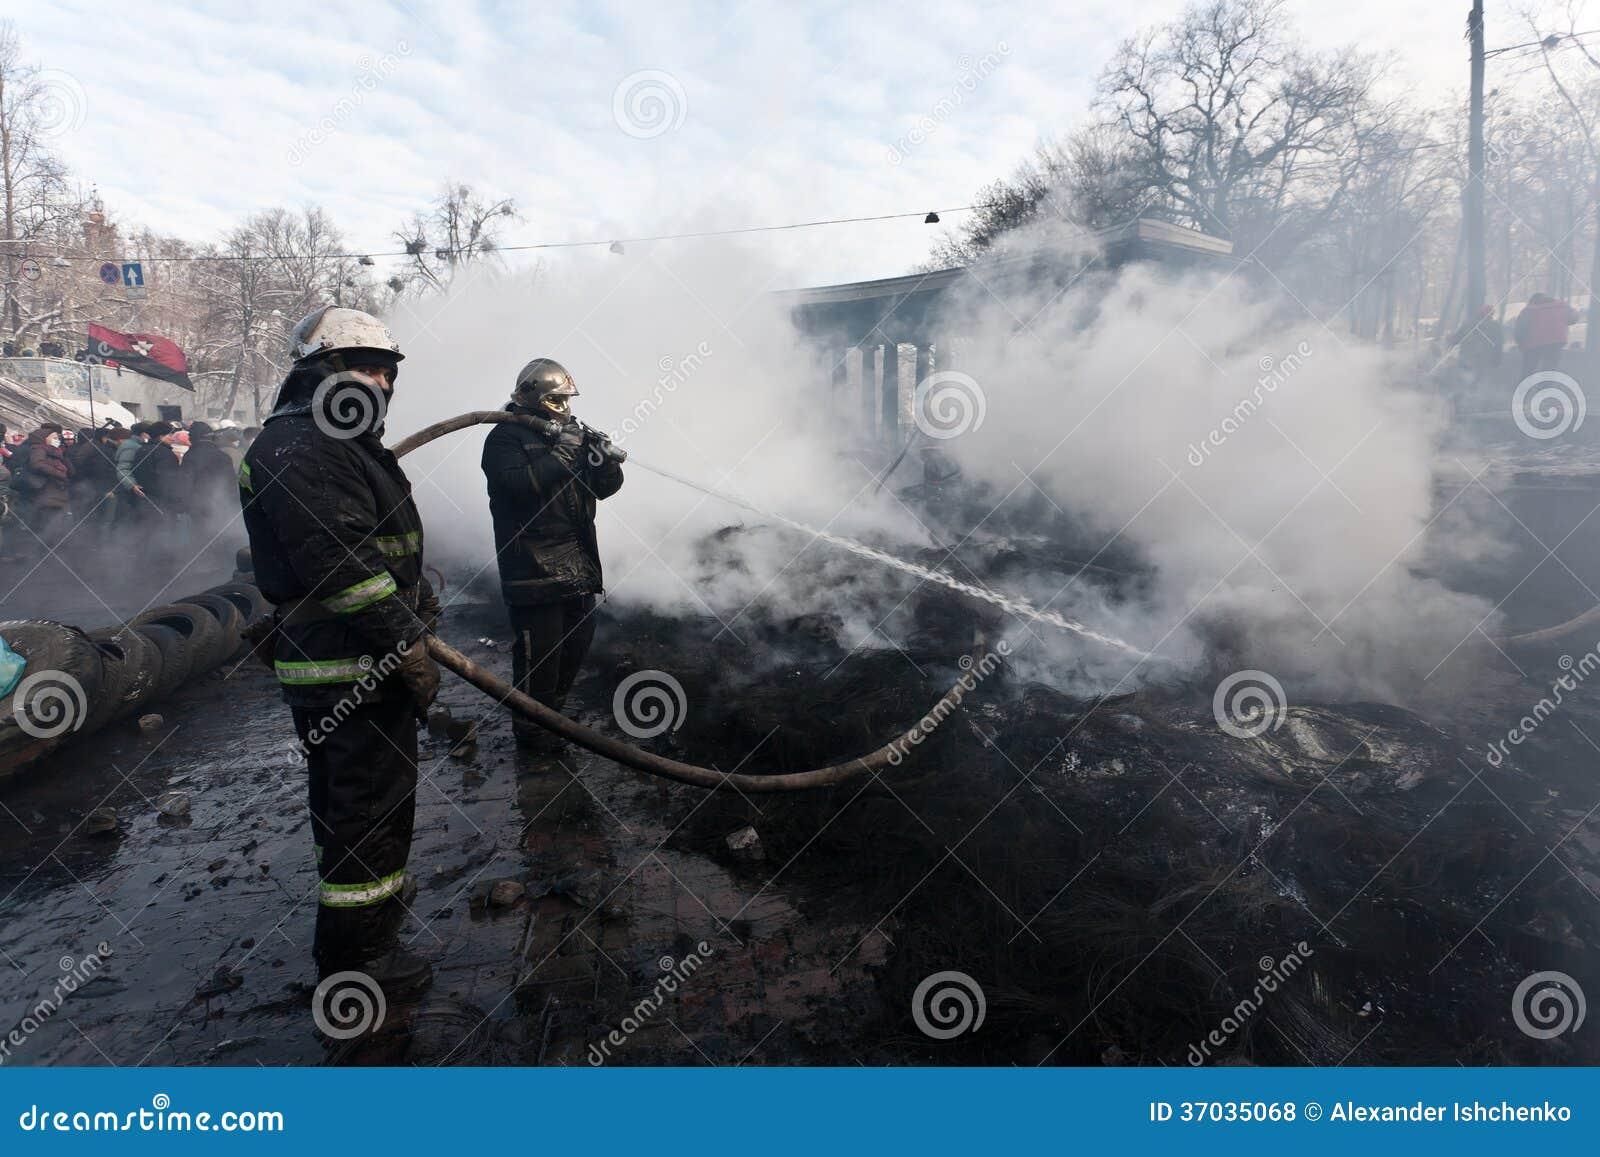 Revolution Ukraine Editorial Stock PhotoUkraine Revolution Fire